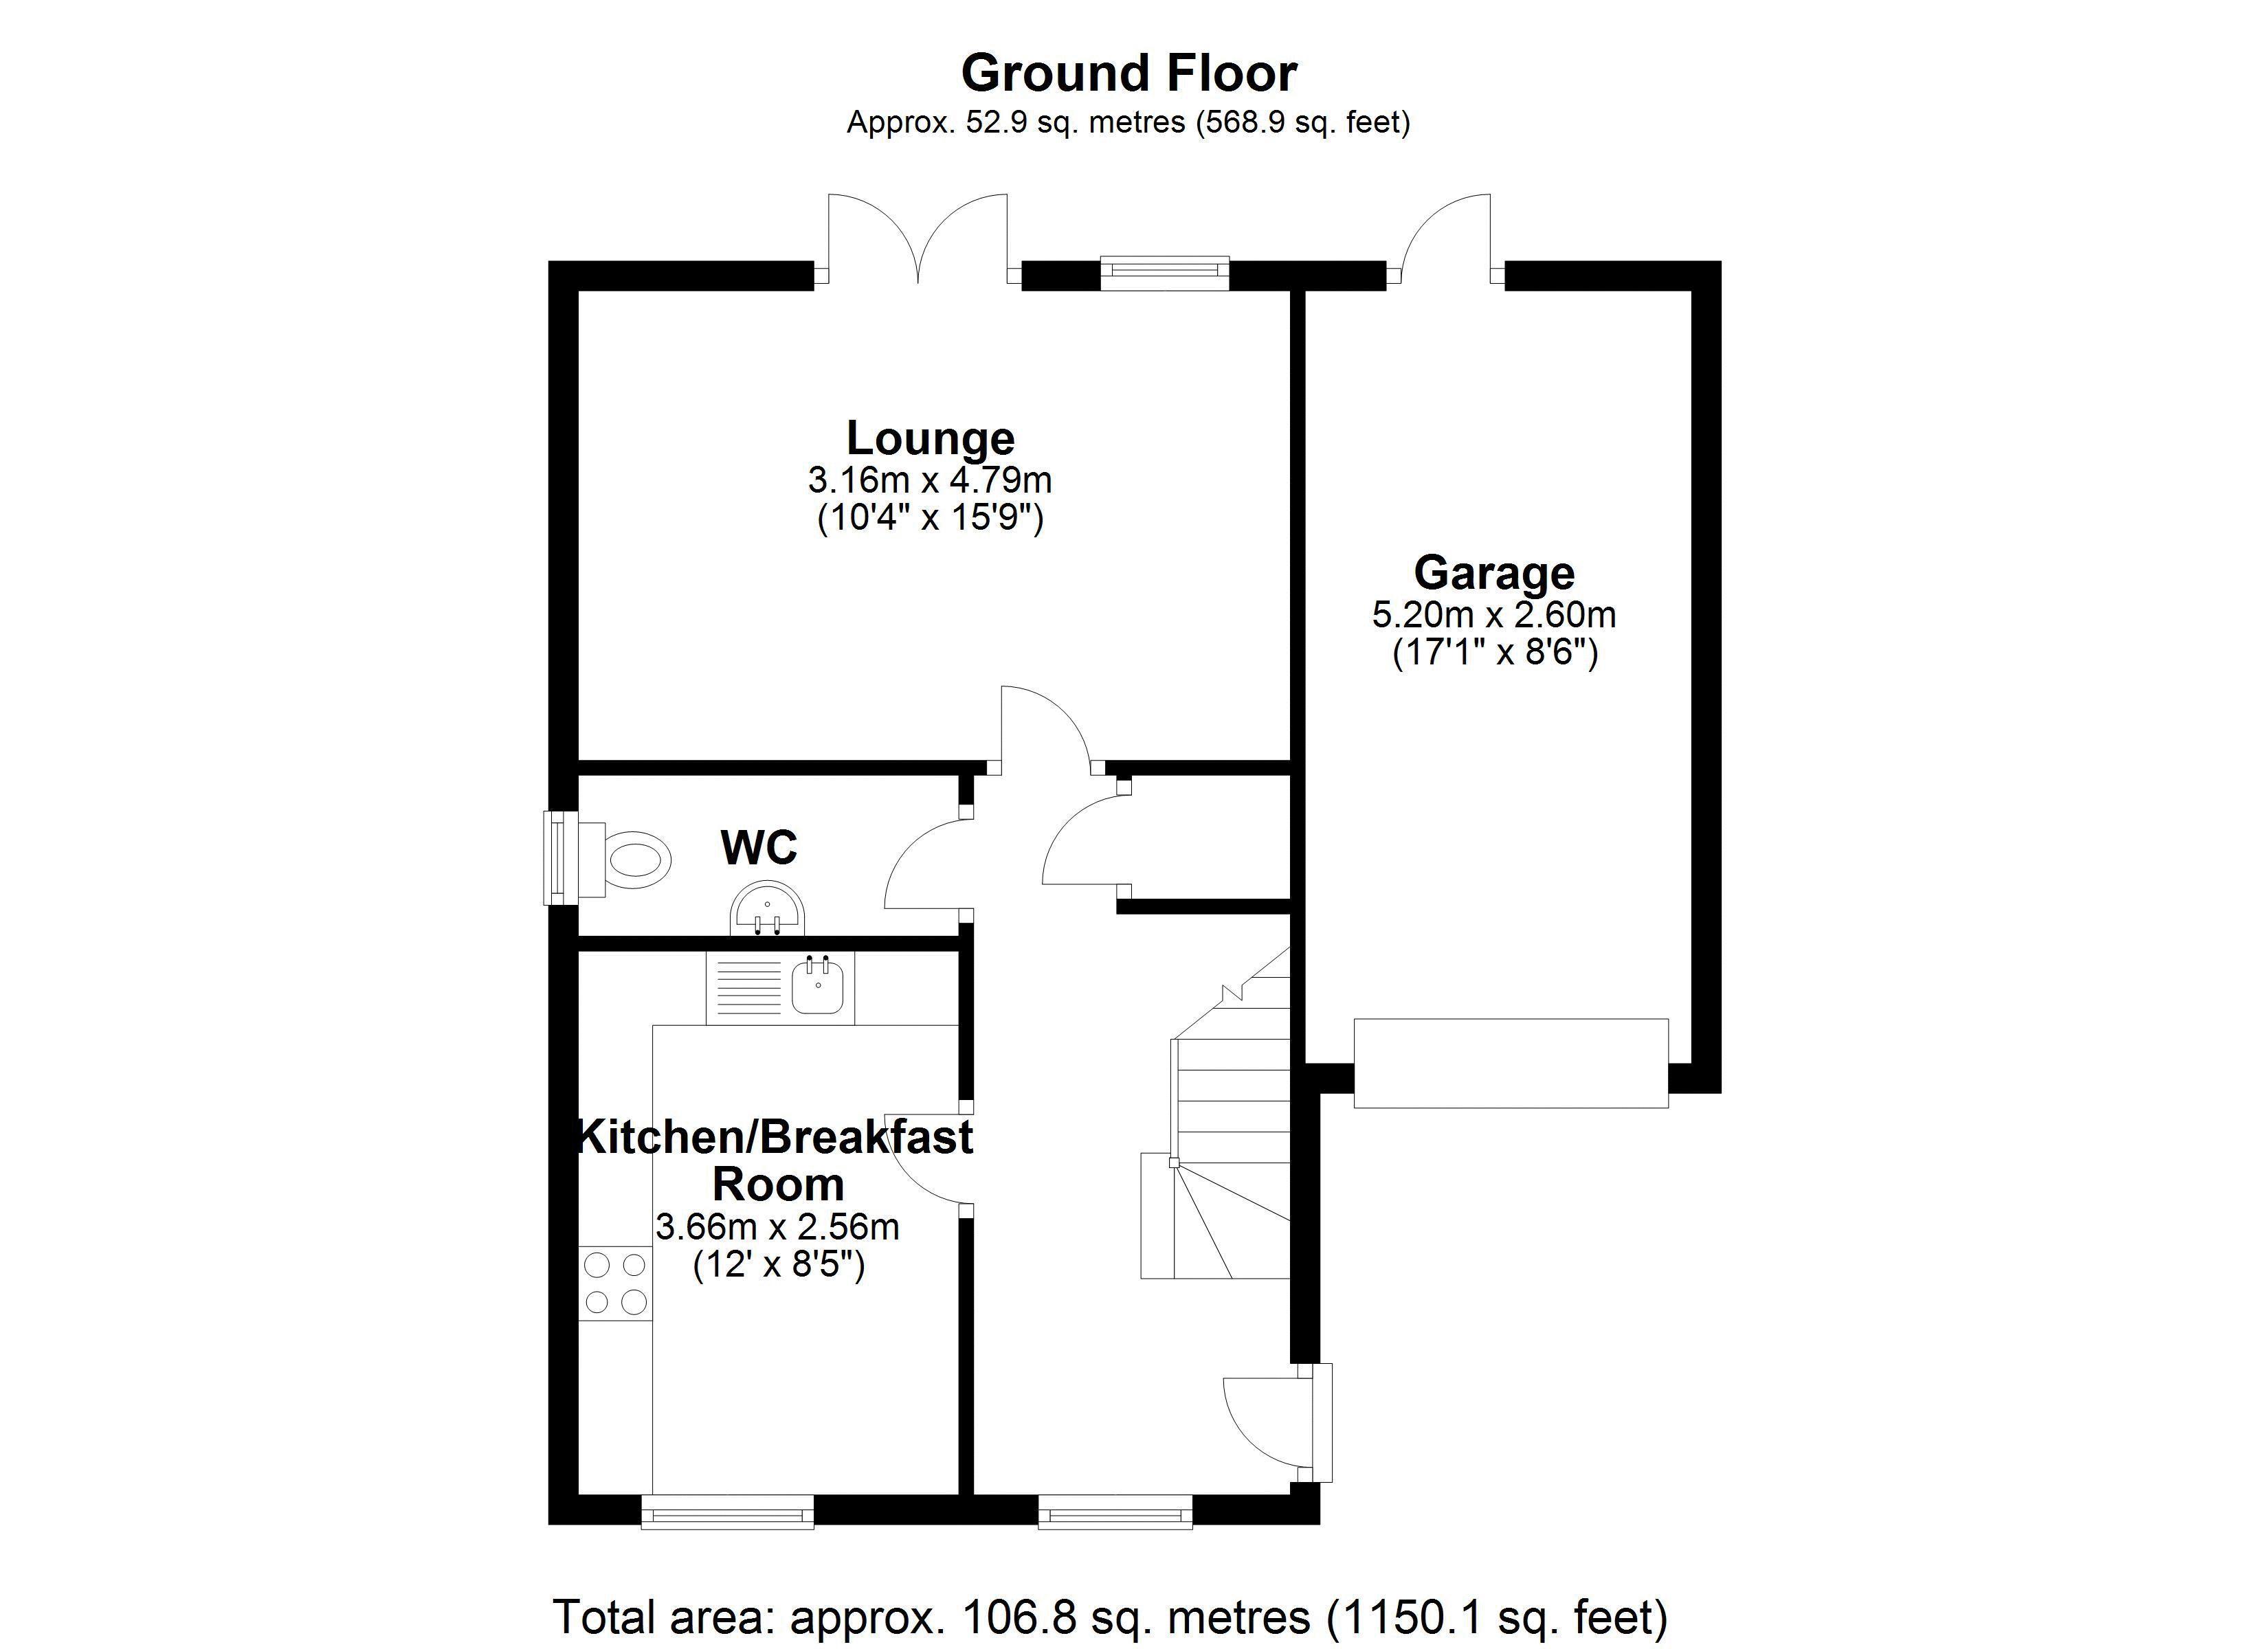 The Embers Ground Floor